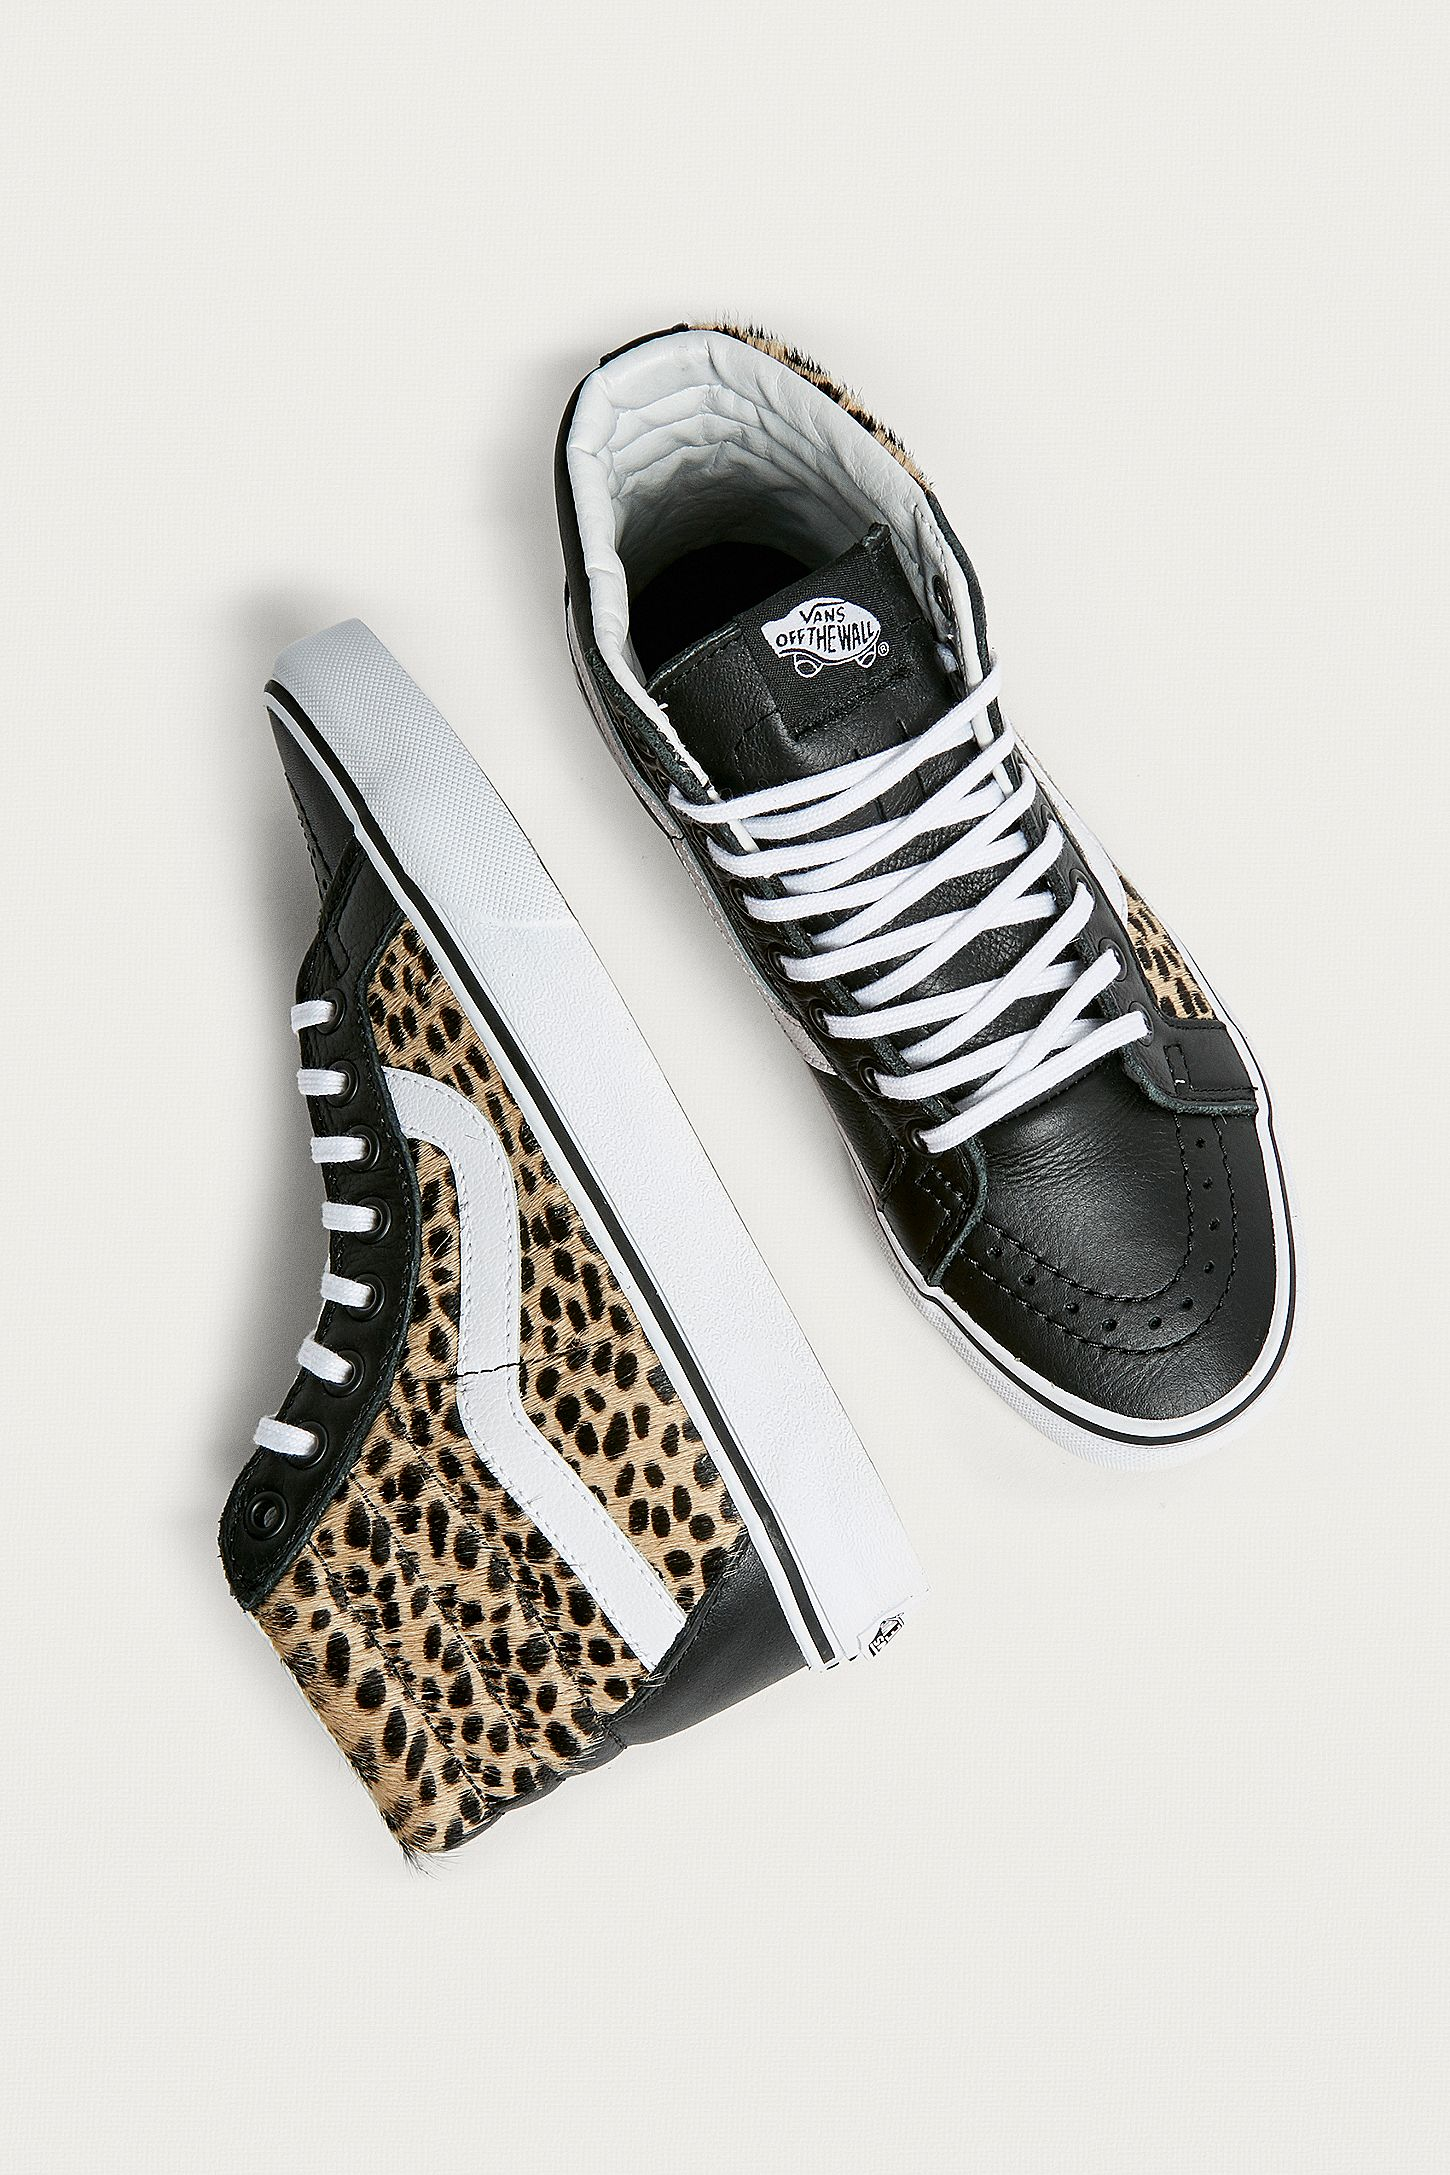 ad5917825e Vans Sk8-Hi Reissue Leopard Print Trainers